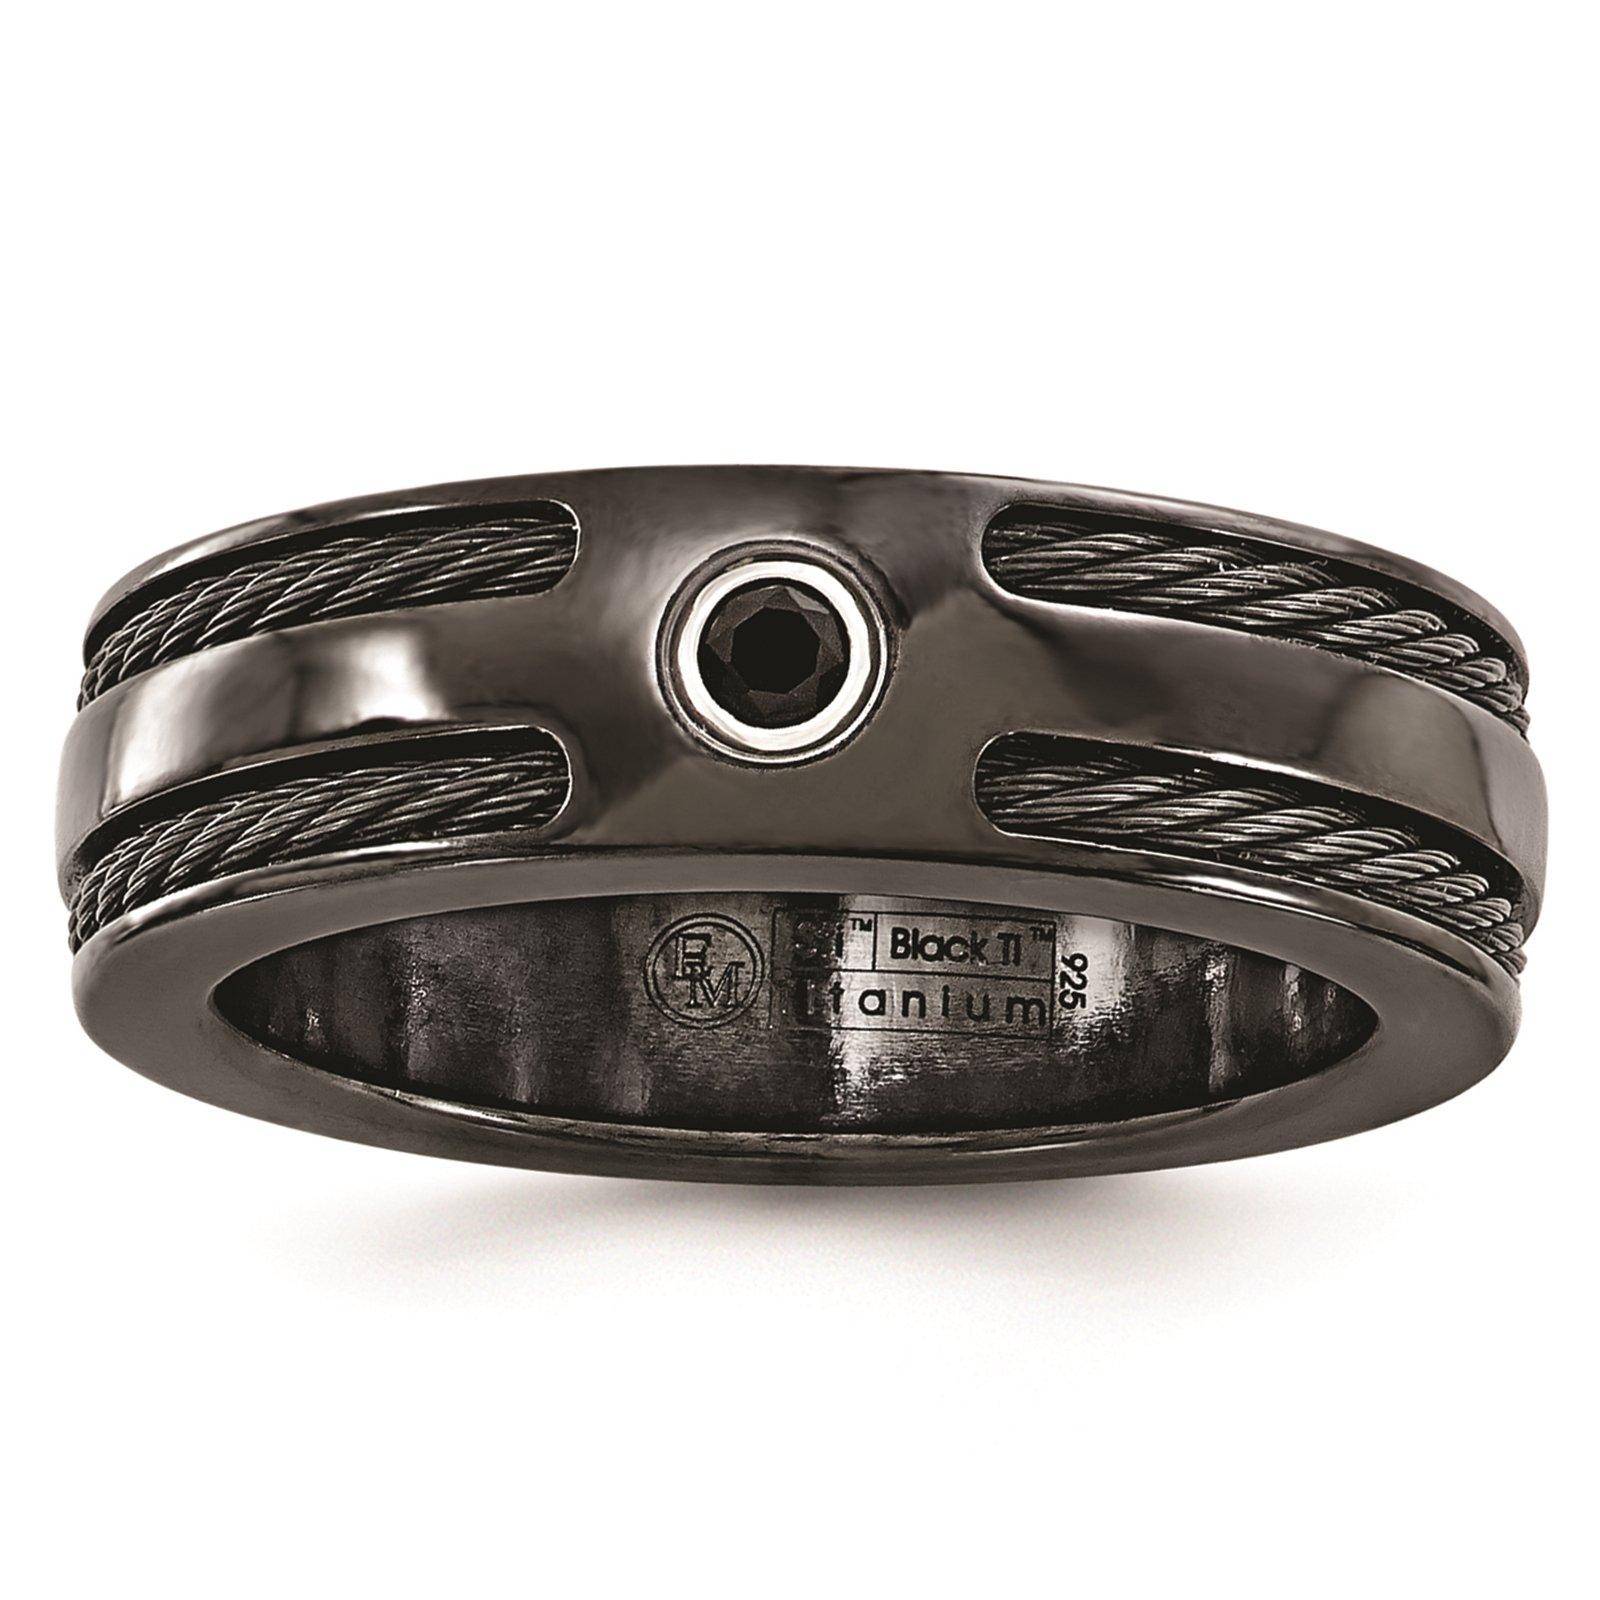 Titanium Black Ti Cable & Black Spinel w/Silver Bezel 7mm Wedding Band Size 8.5 by Edward Mirell